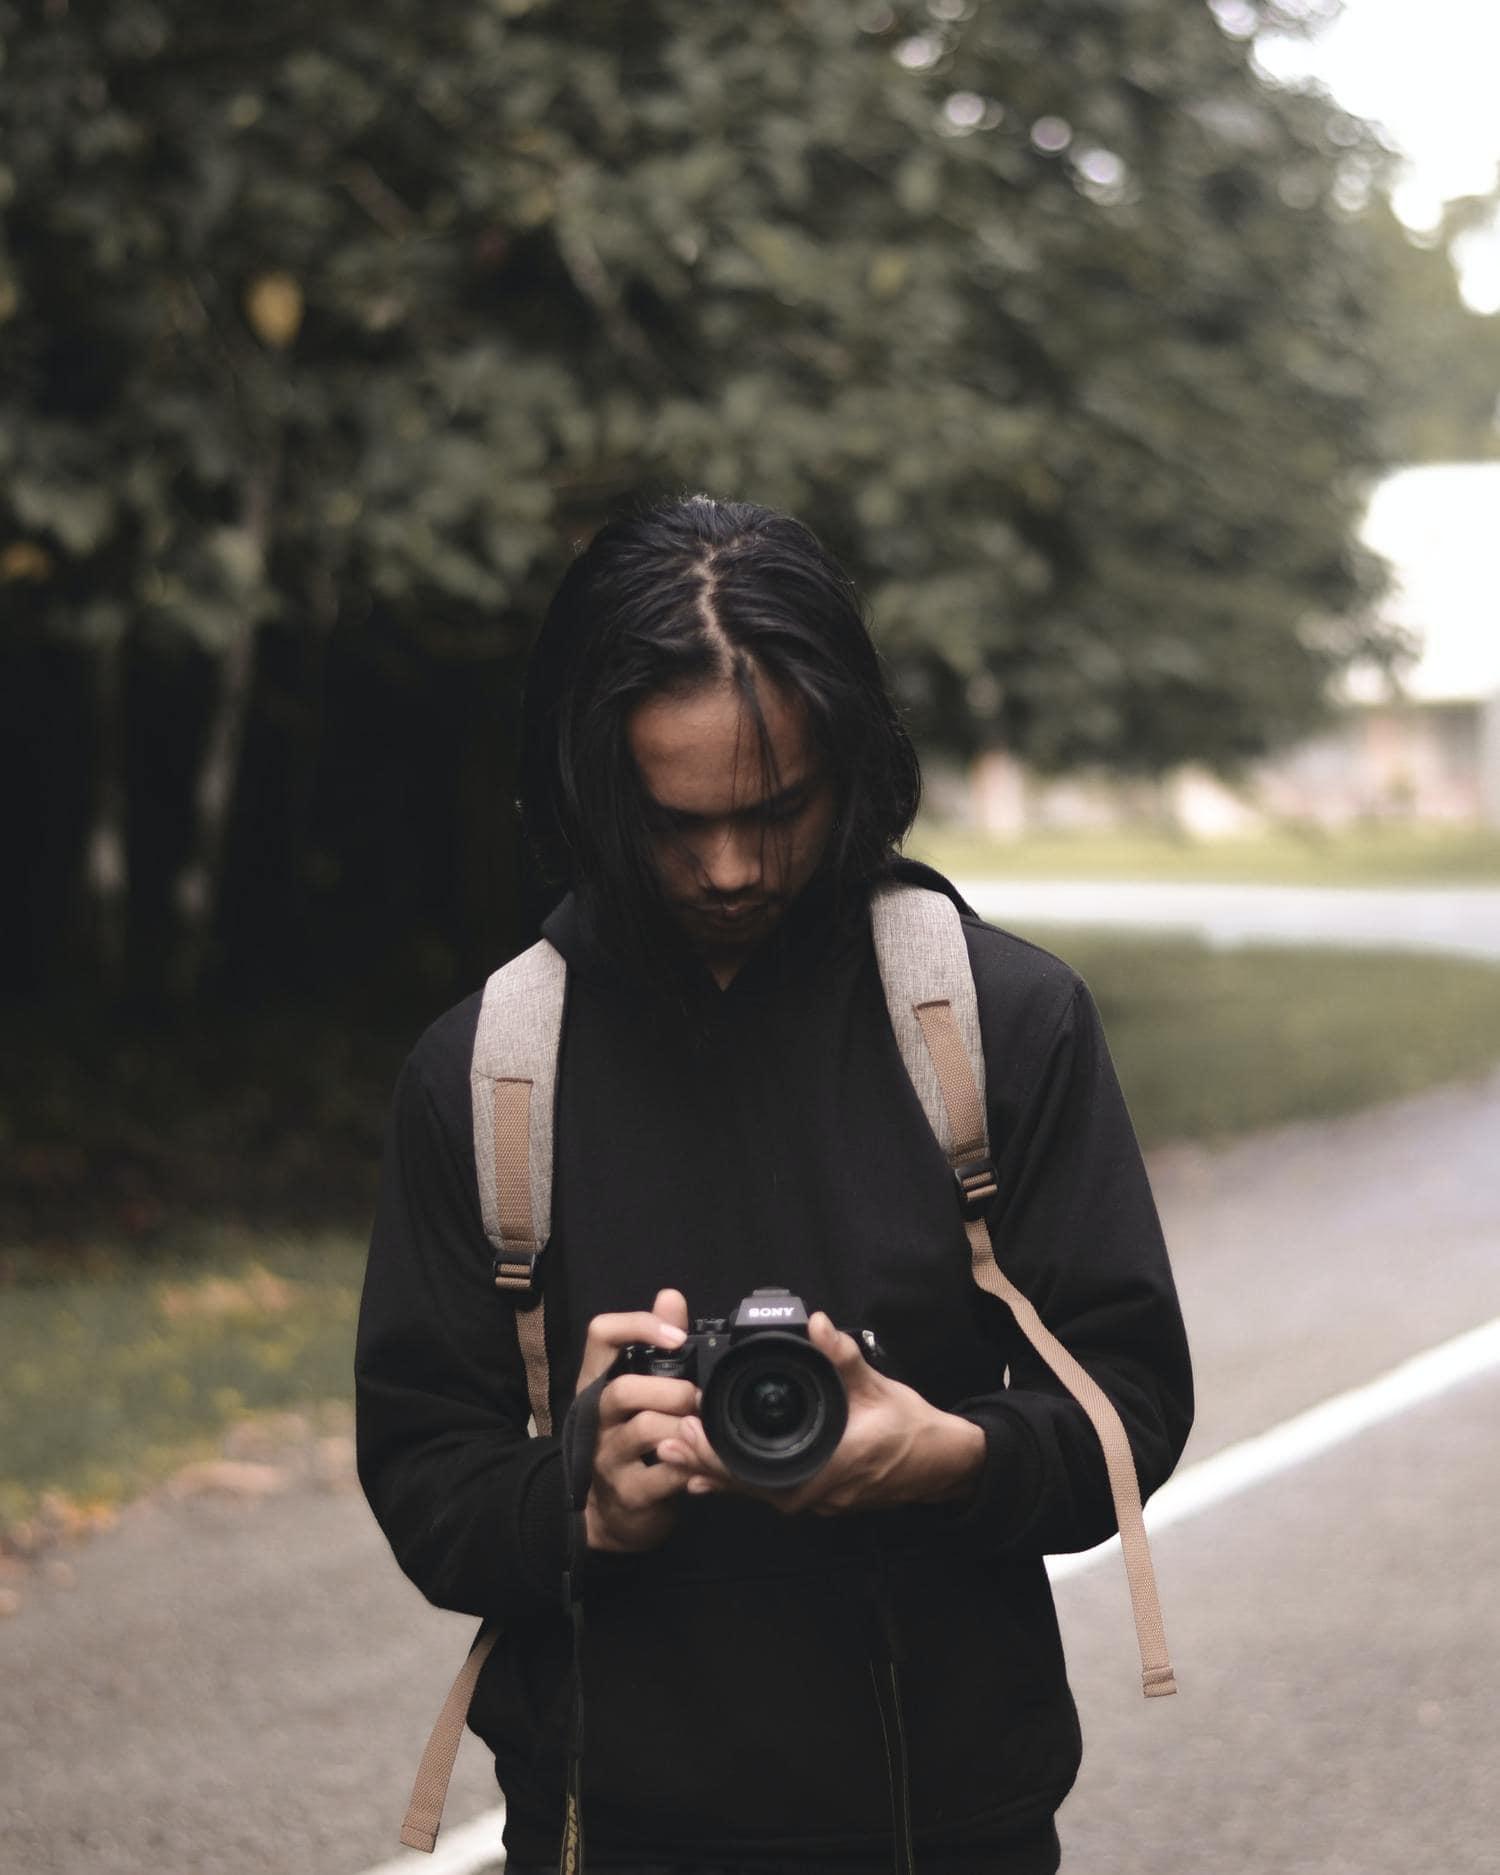 Fotógrafo disparando mirando a través de la pantalla